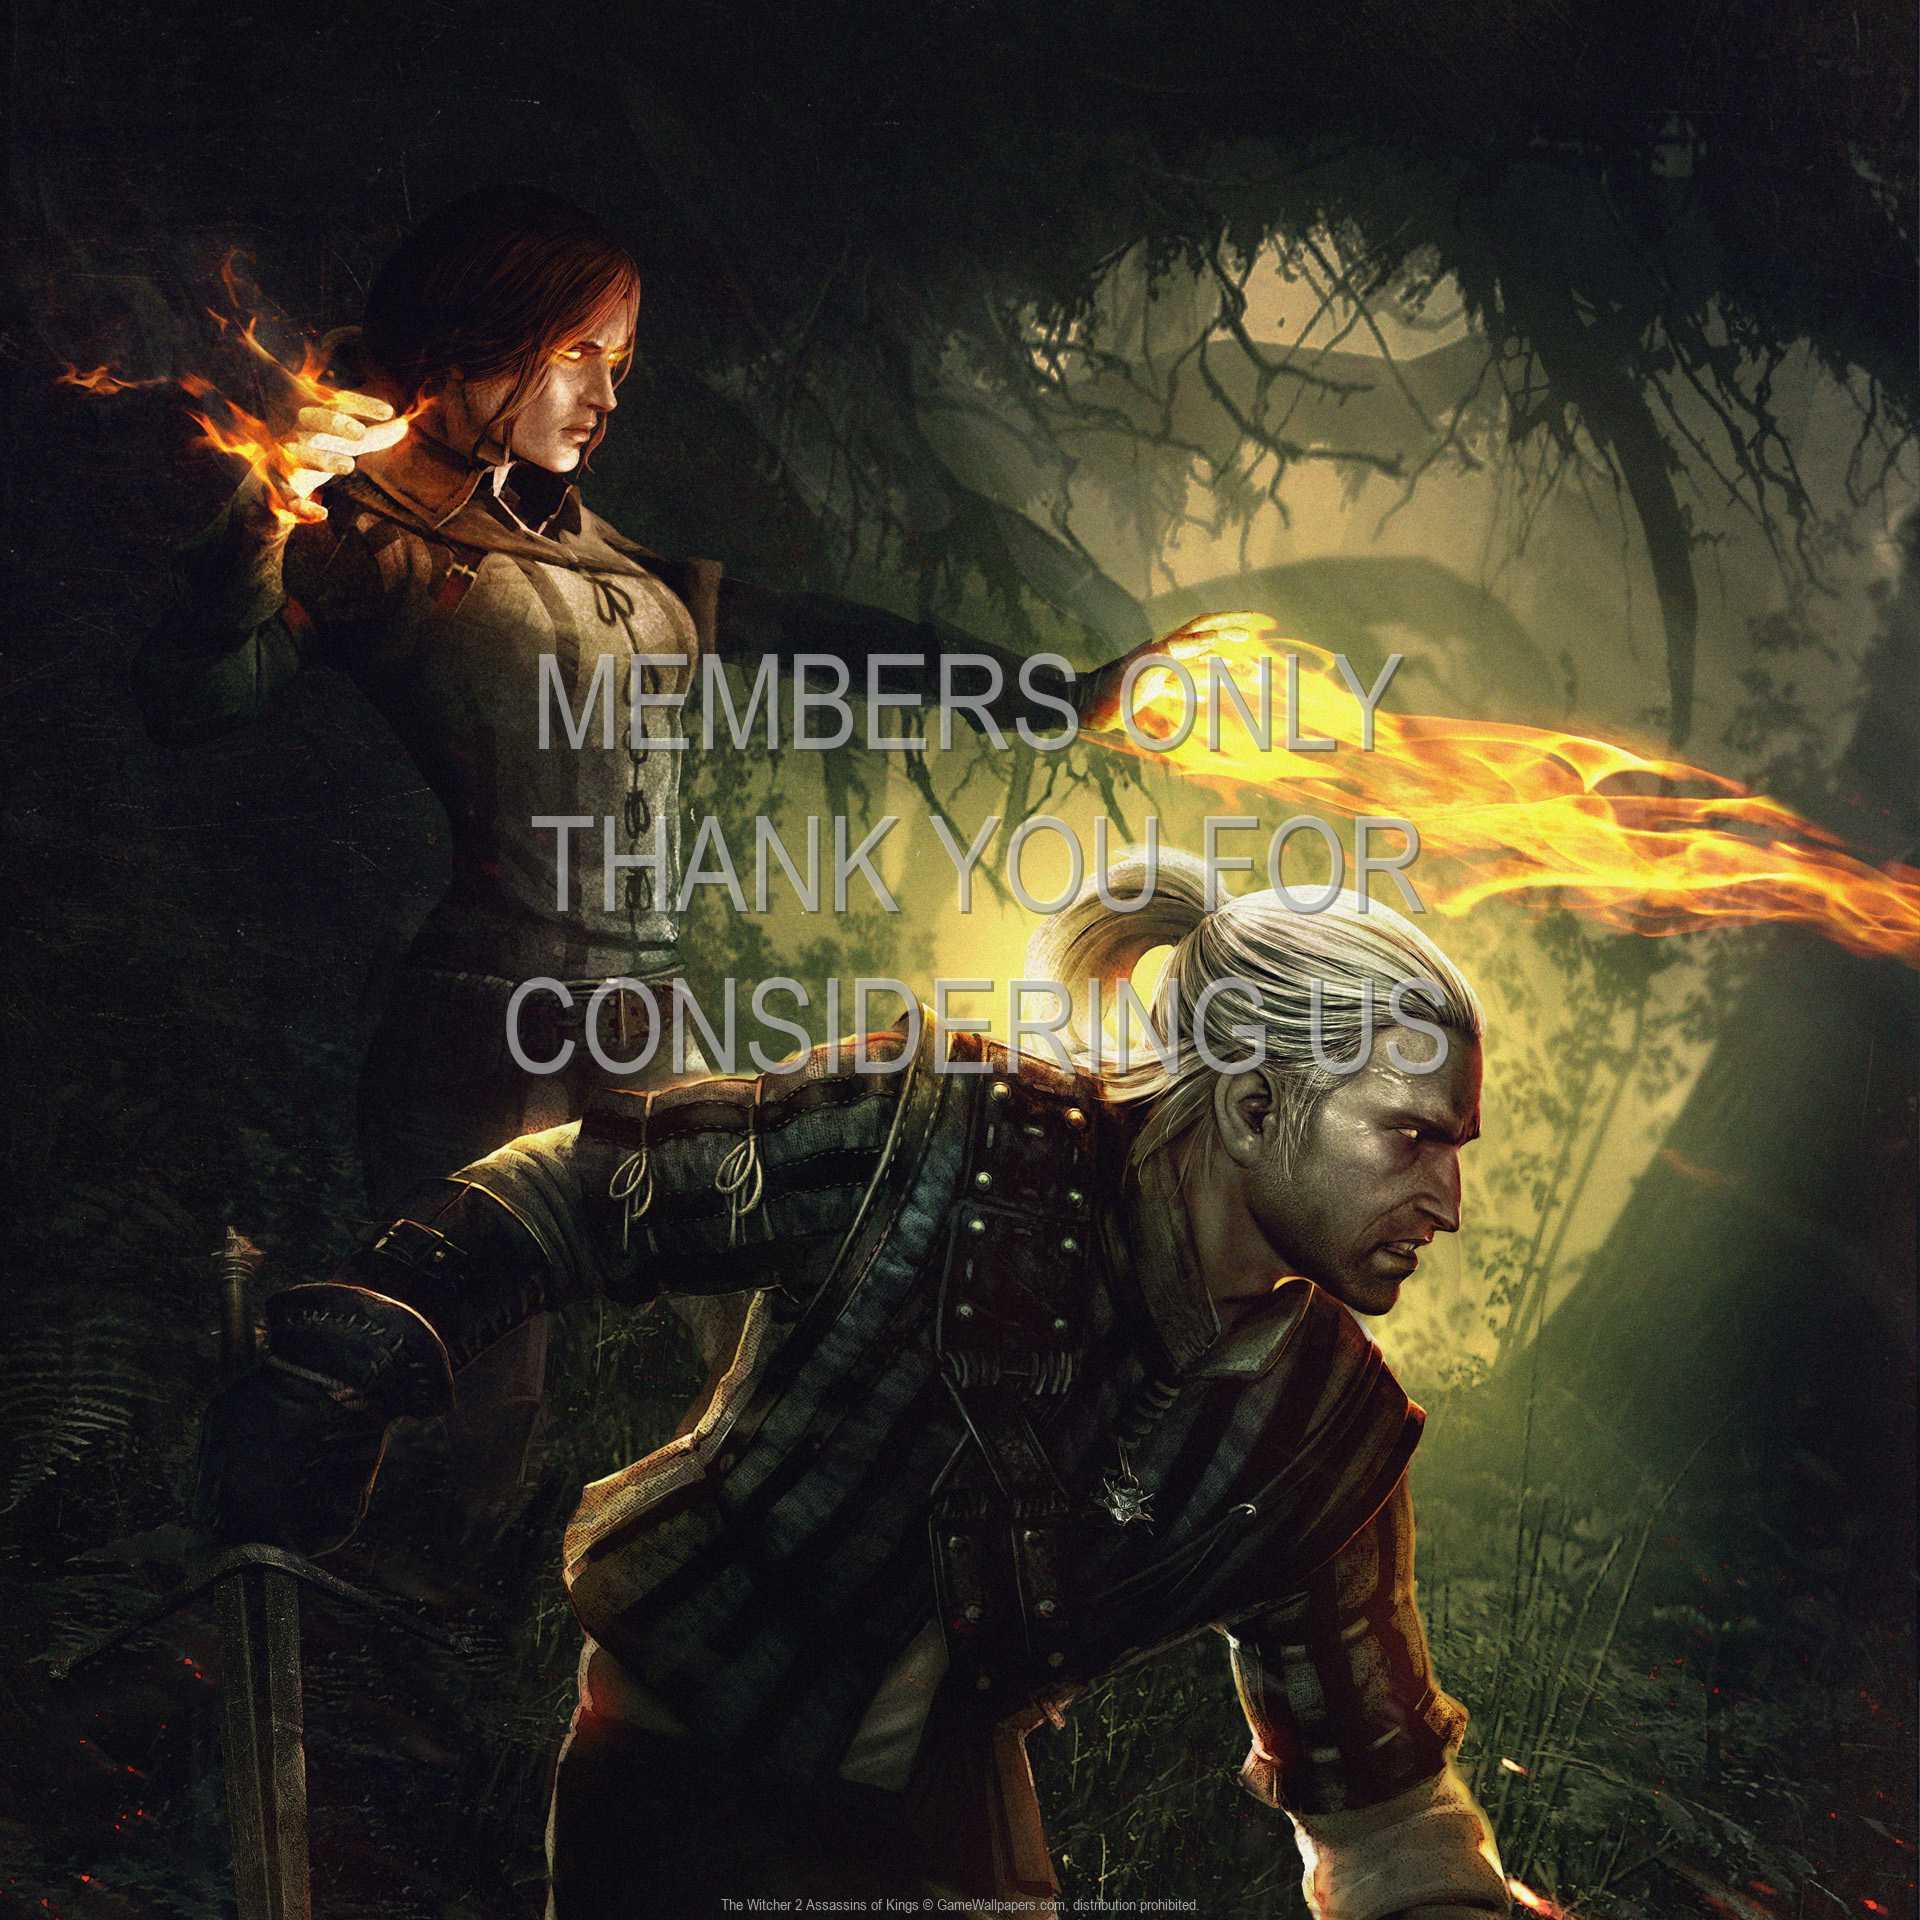 The Witcher 2: Assassins of Kings 1080p Horizontal Handy Hintergrundbild 08